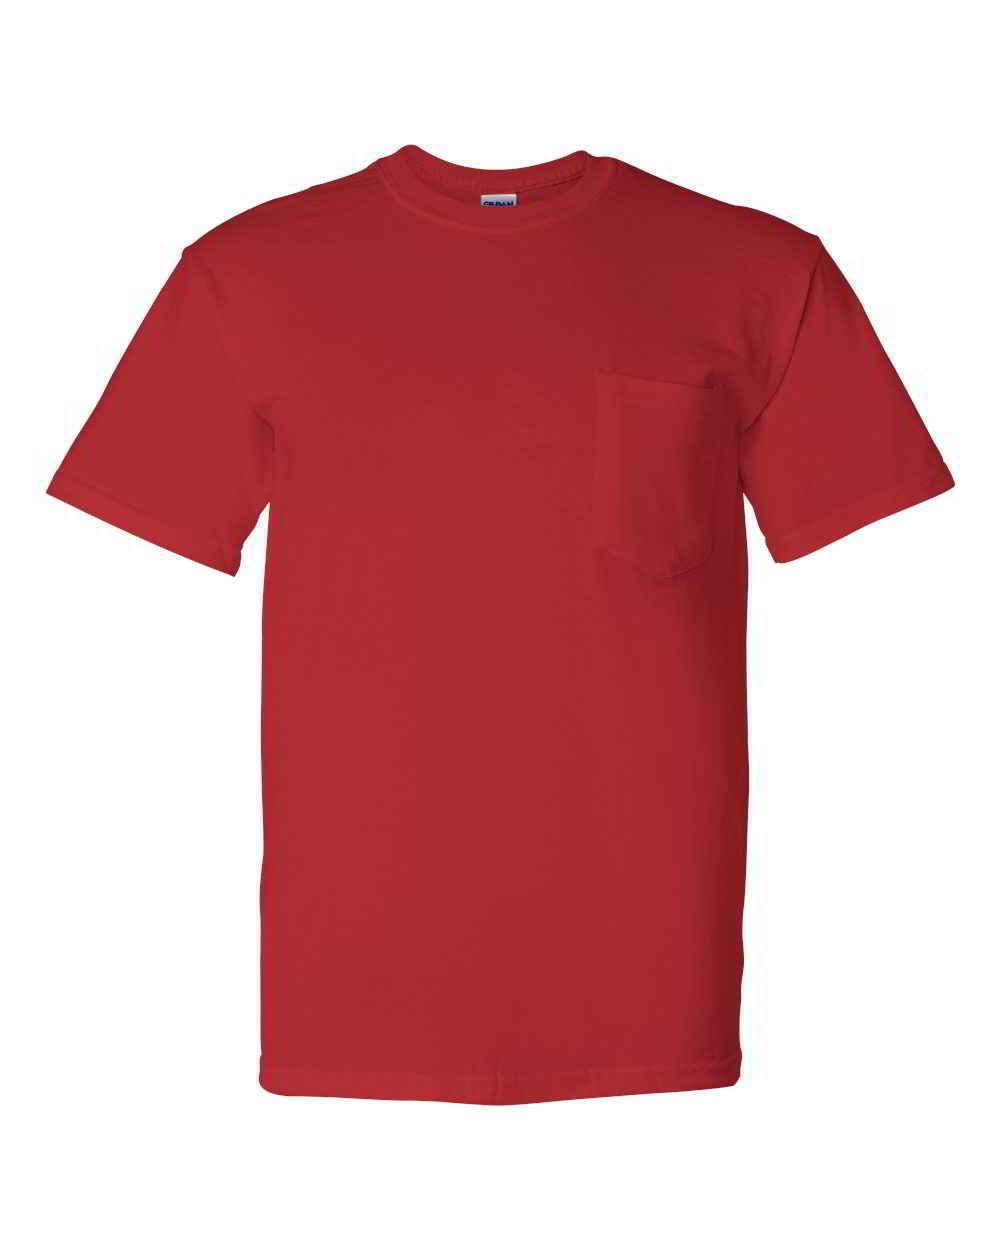 Gildan-DryBlend-Mens-50-50-Short-Sleeve-Tees-T-Shirt-with-a-Pocket thumbnail 8